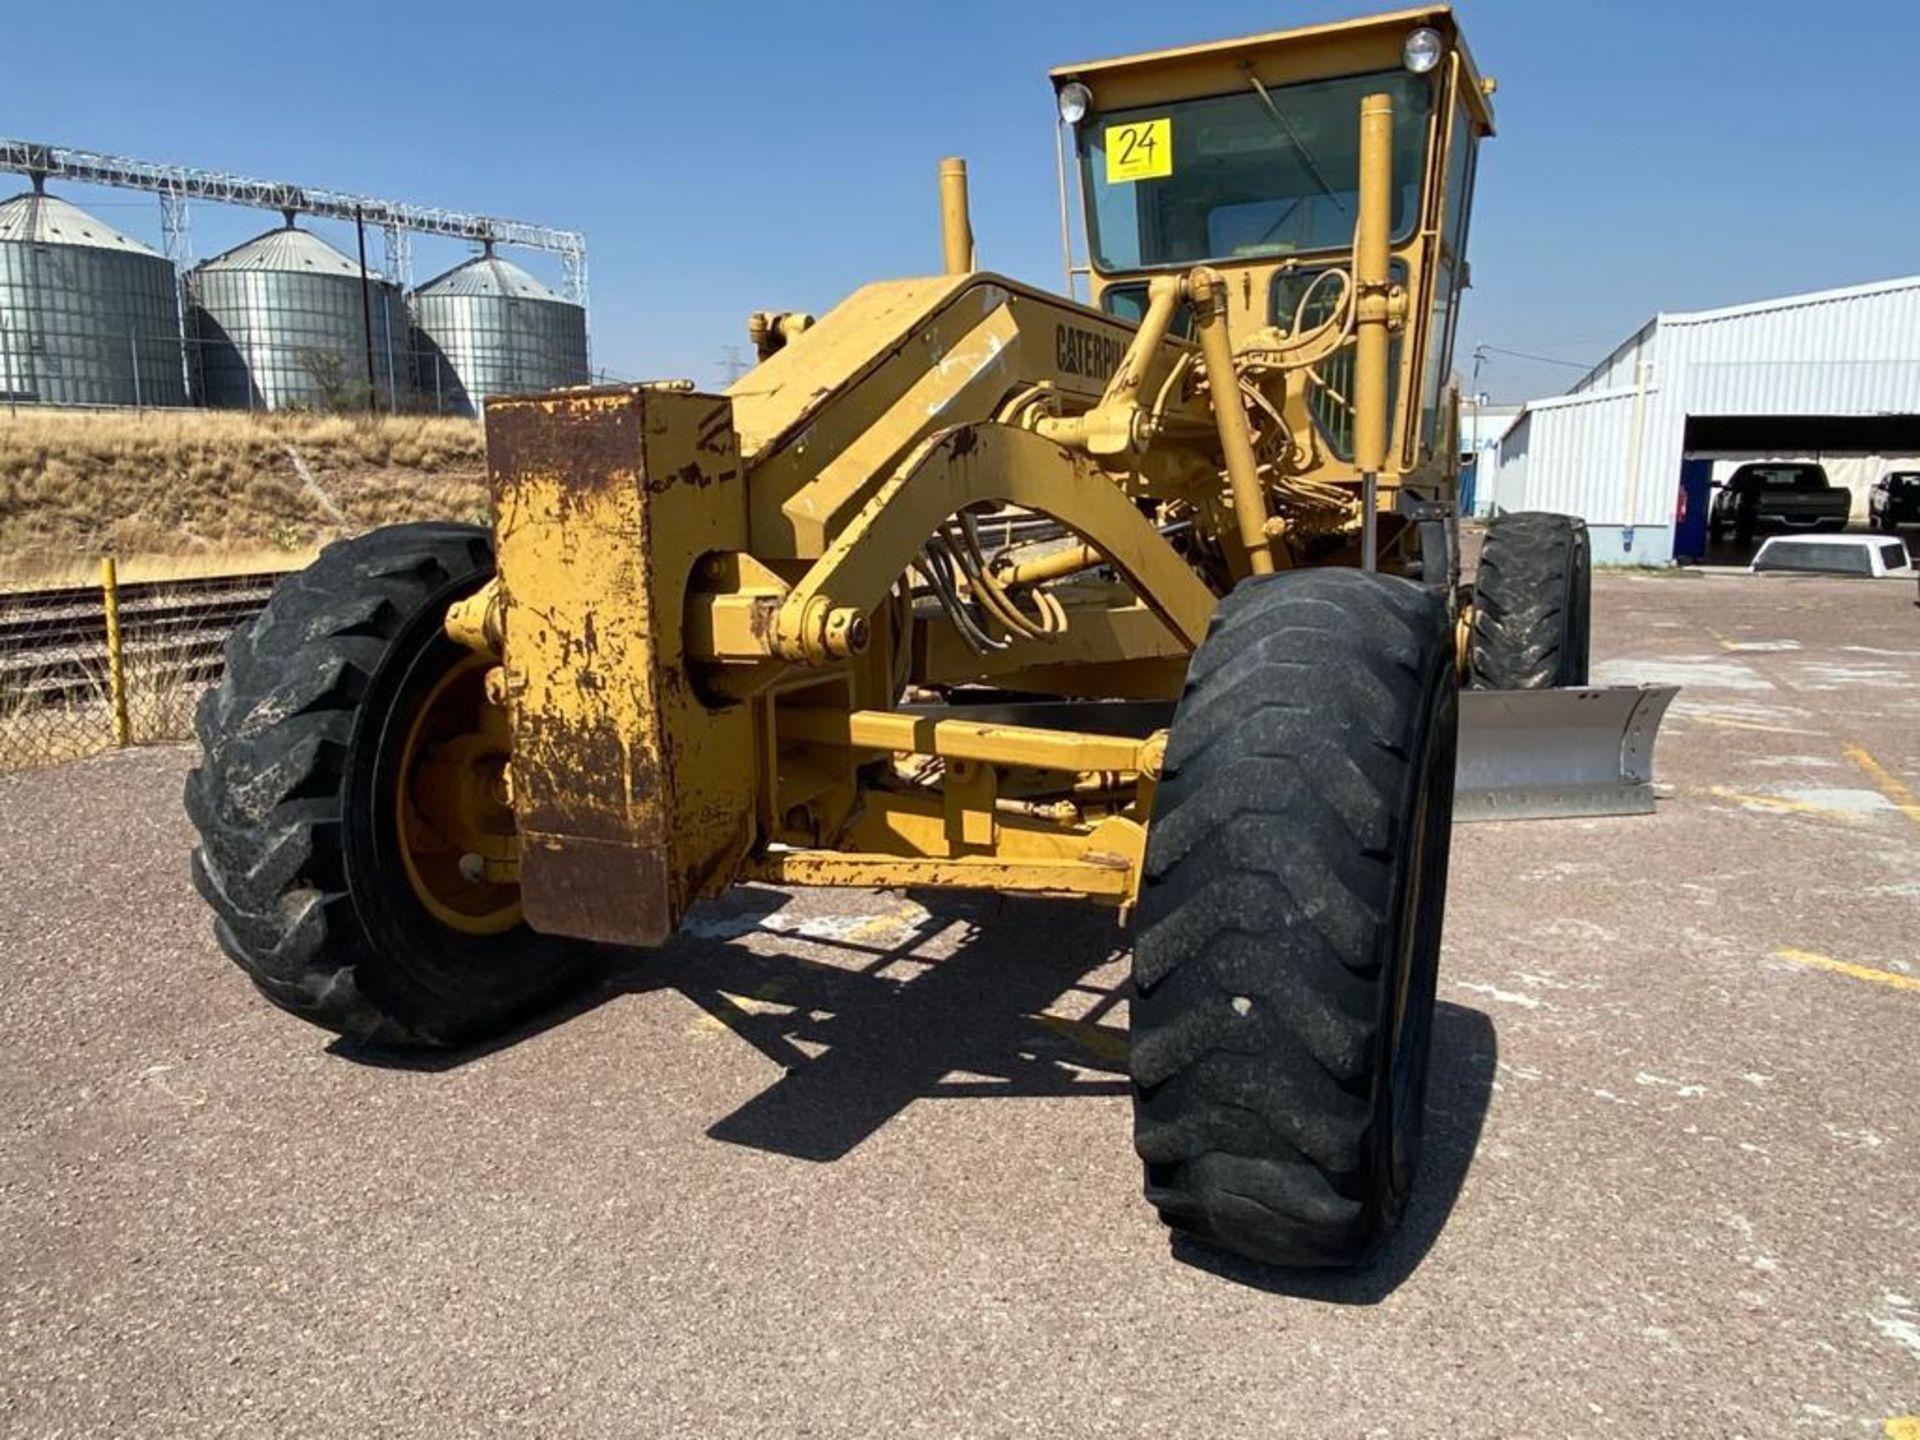 Caterpillar 120G Motor Grader, Serial number 87V09646, Motor number PQ883-2/07Z28983 - Image 5 of 61